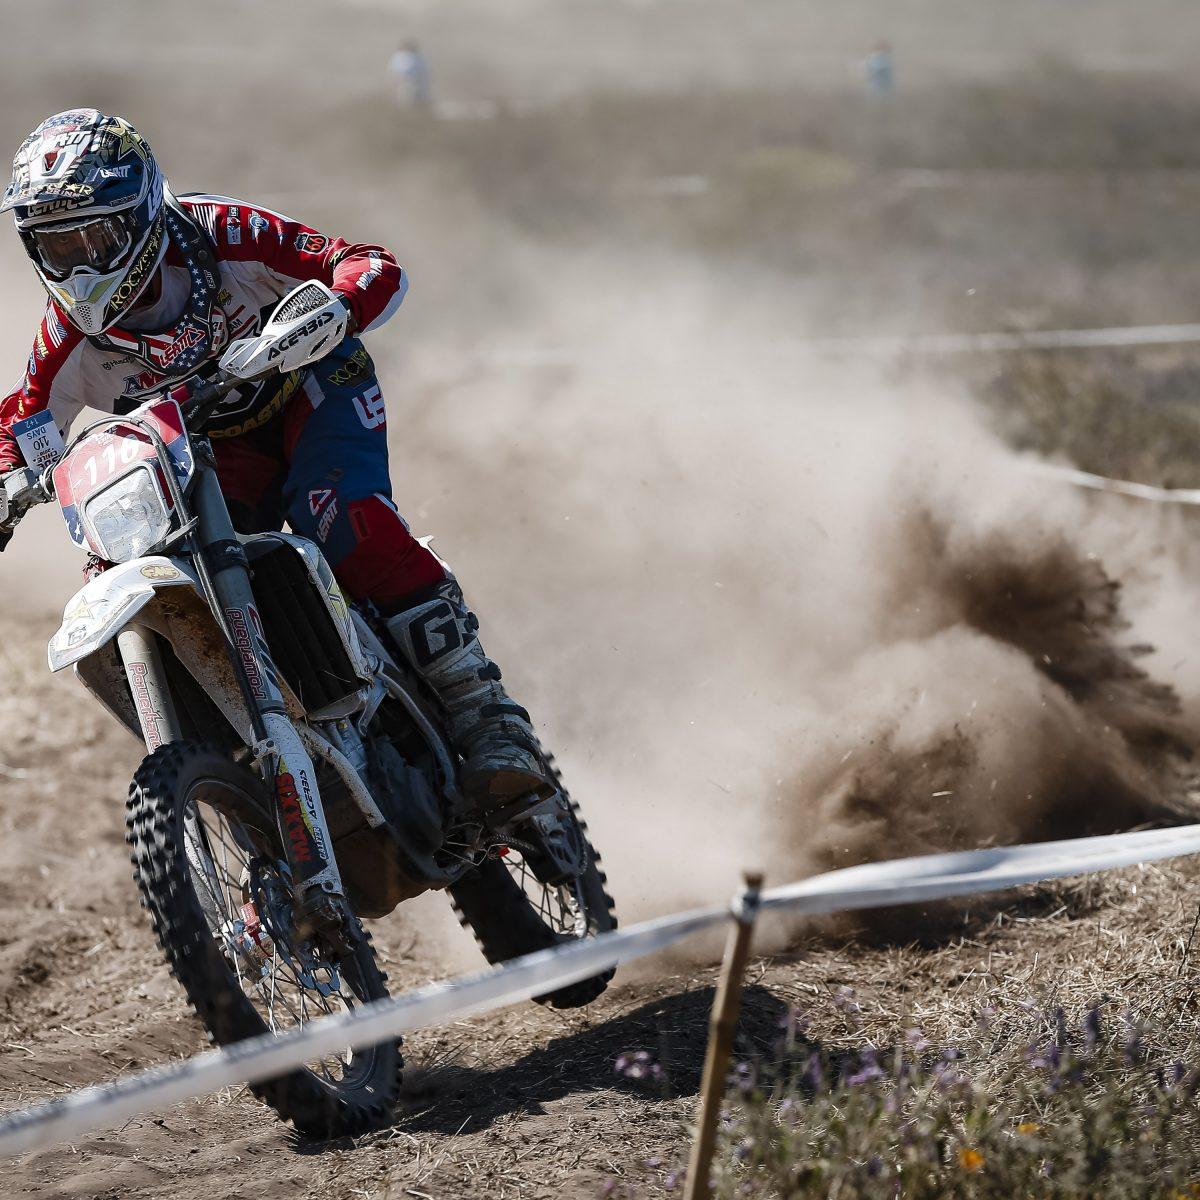 Ryan Sipes – Rockstar Energy Husqvarna Factory Racing